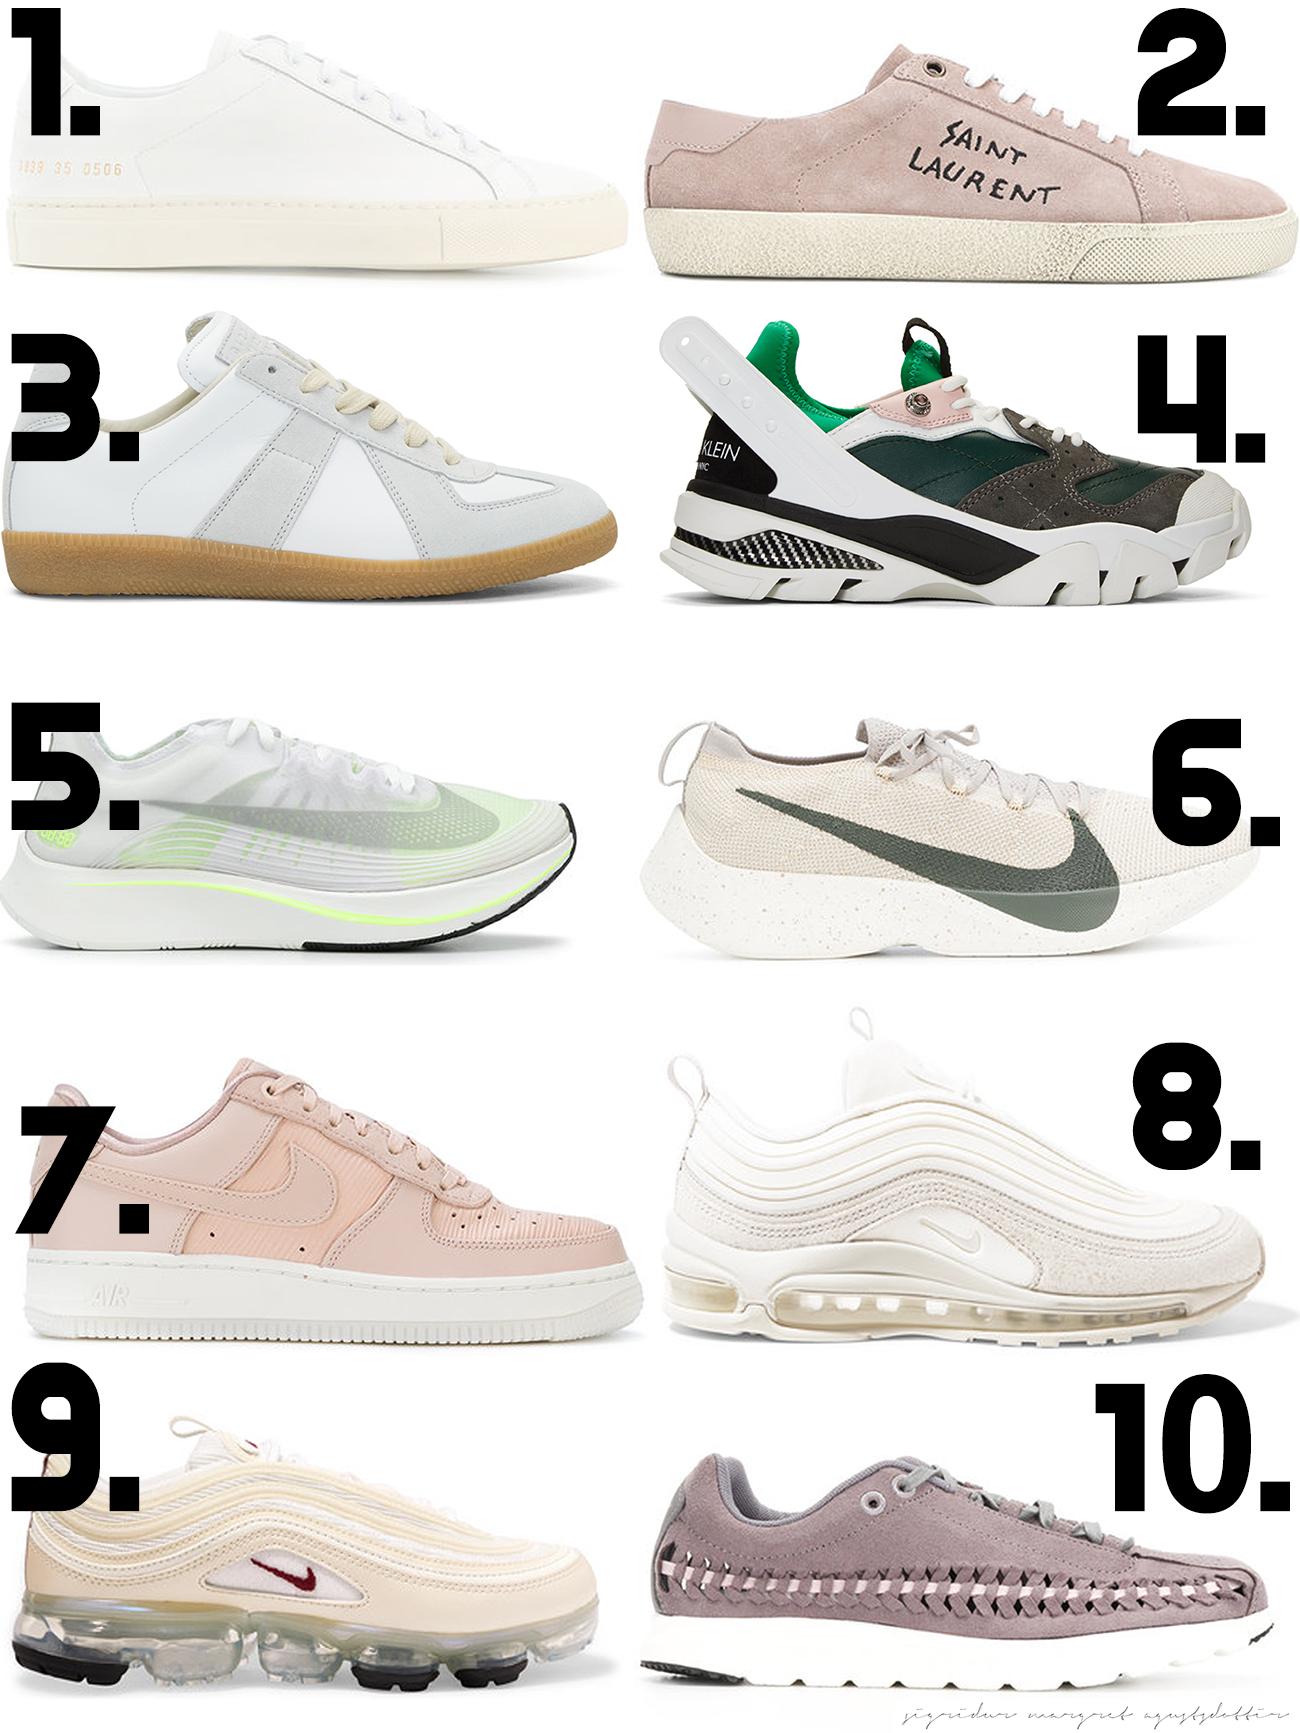 TOP 10 SNEAKERS ON SALE: